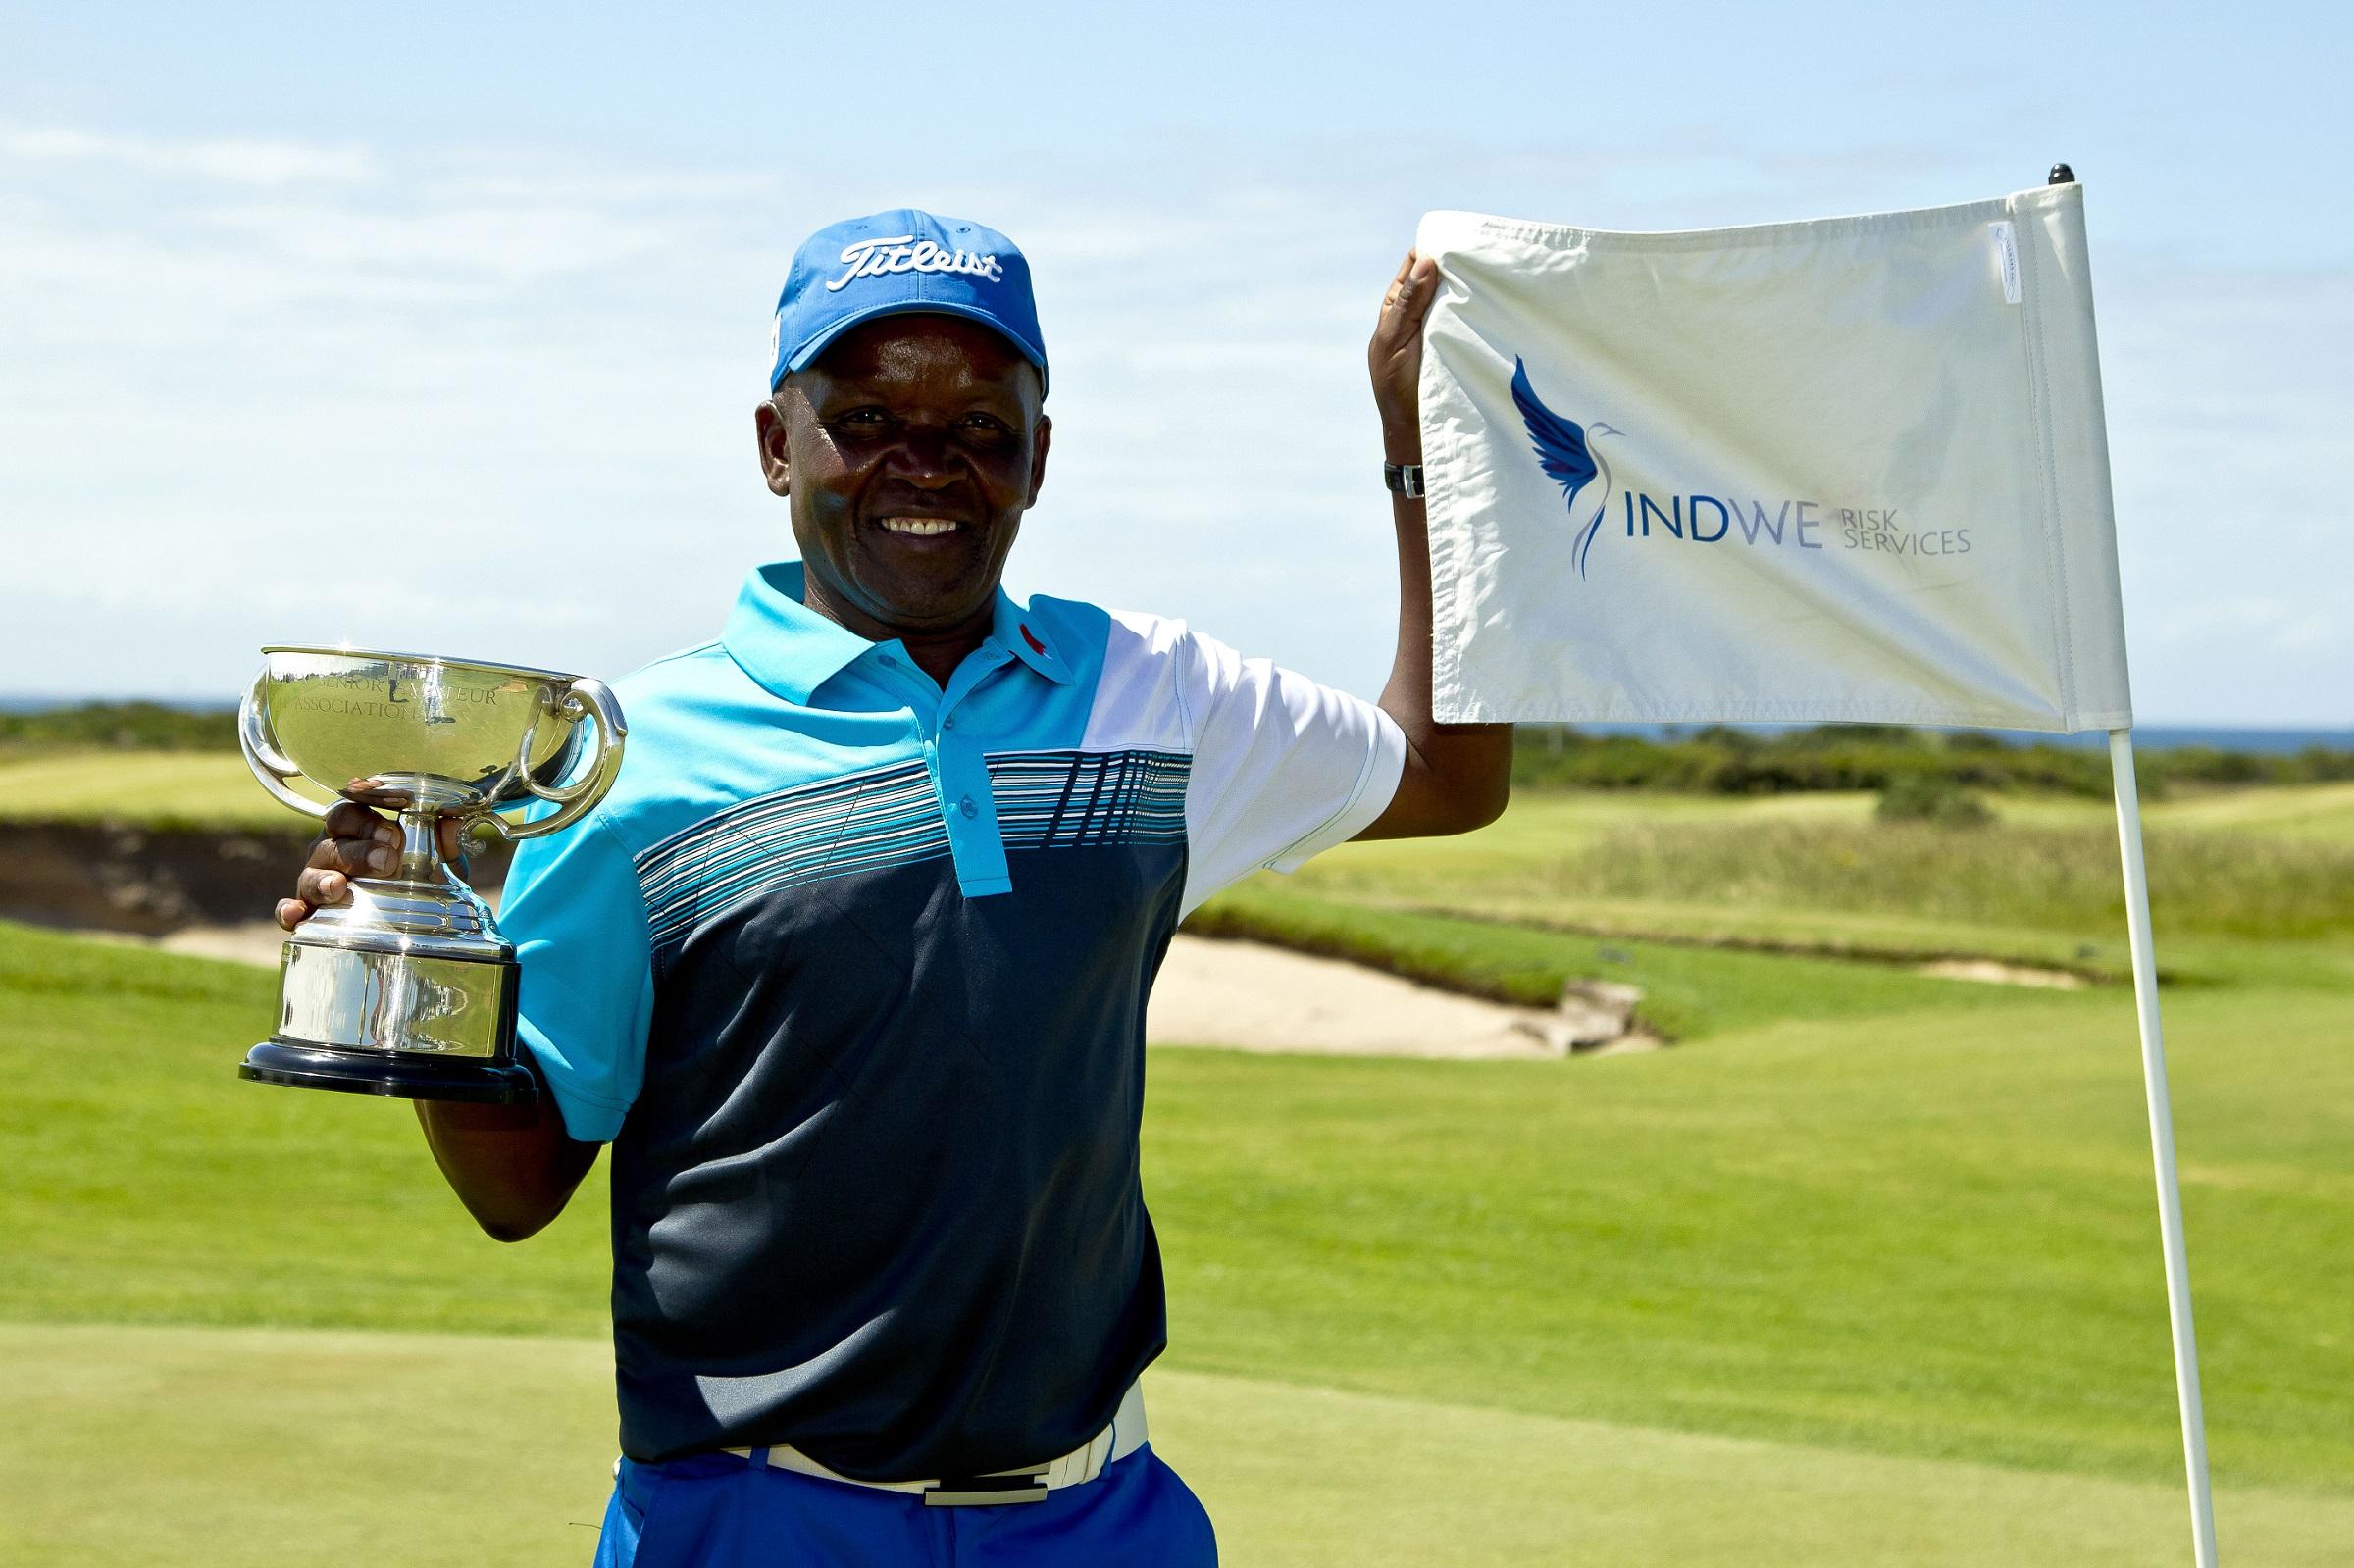 Passing of top senior golfer Konzani a great loss